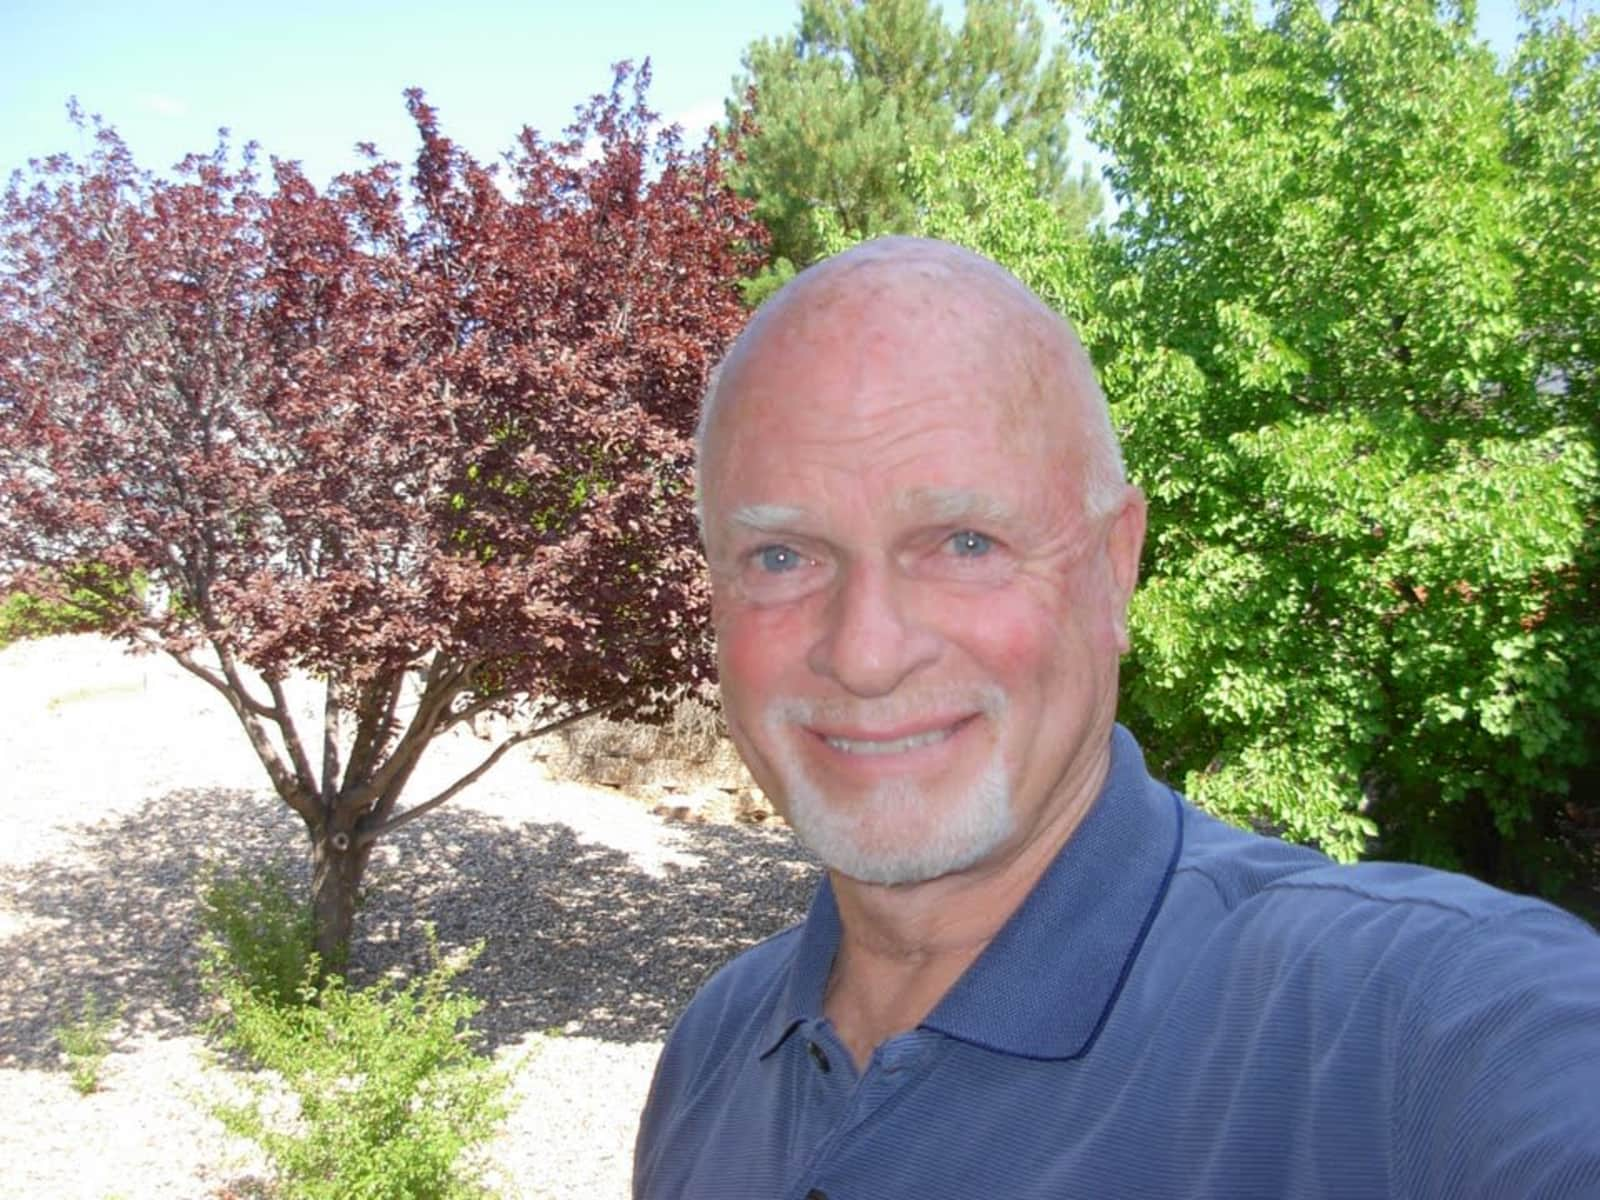 Frank from Prescott, Arizona, United States